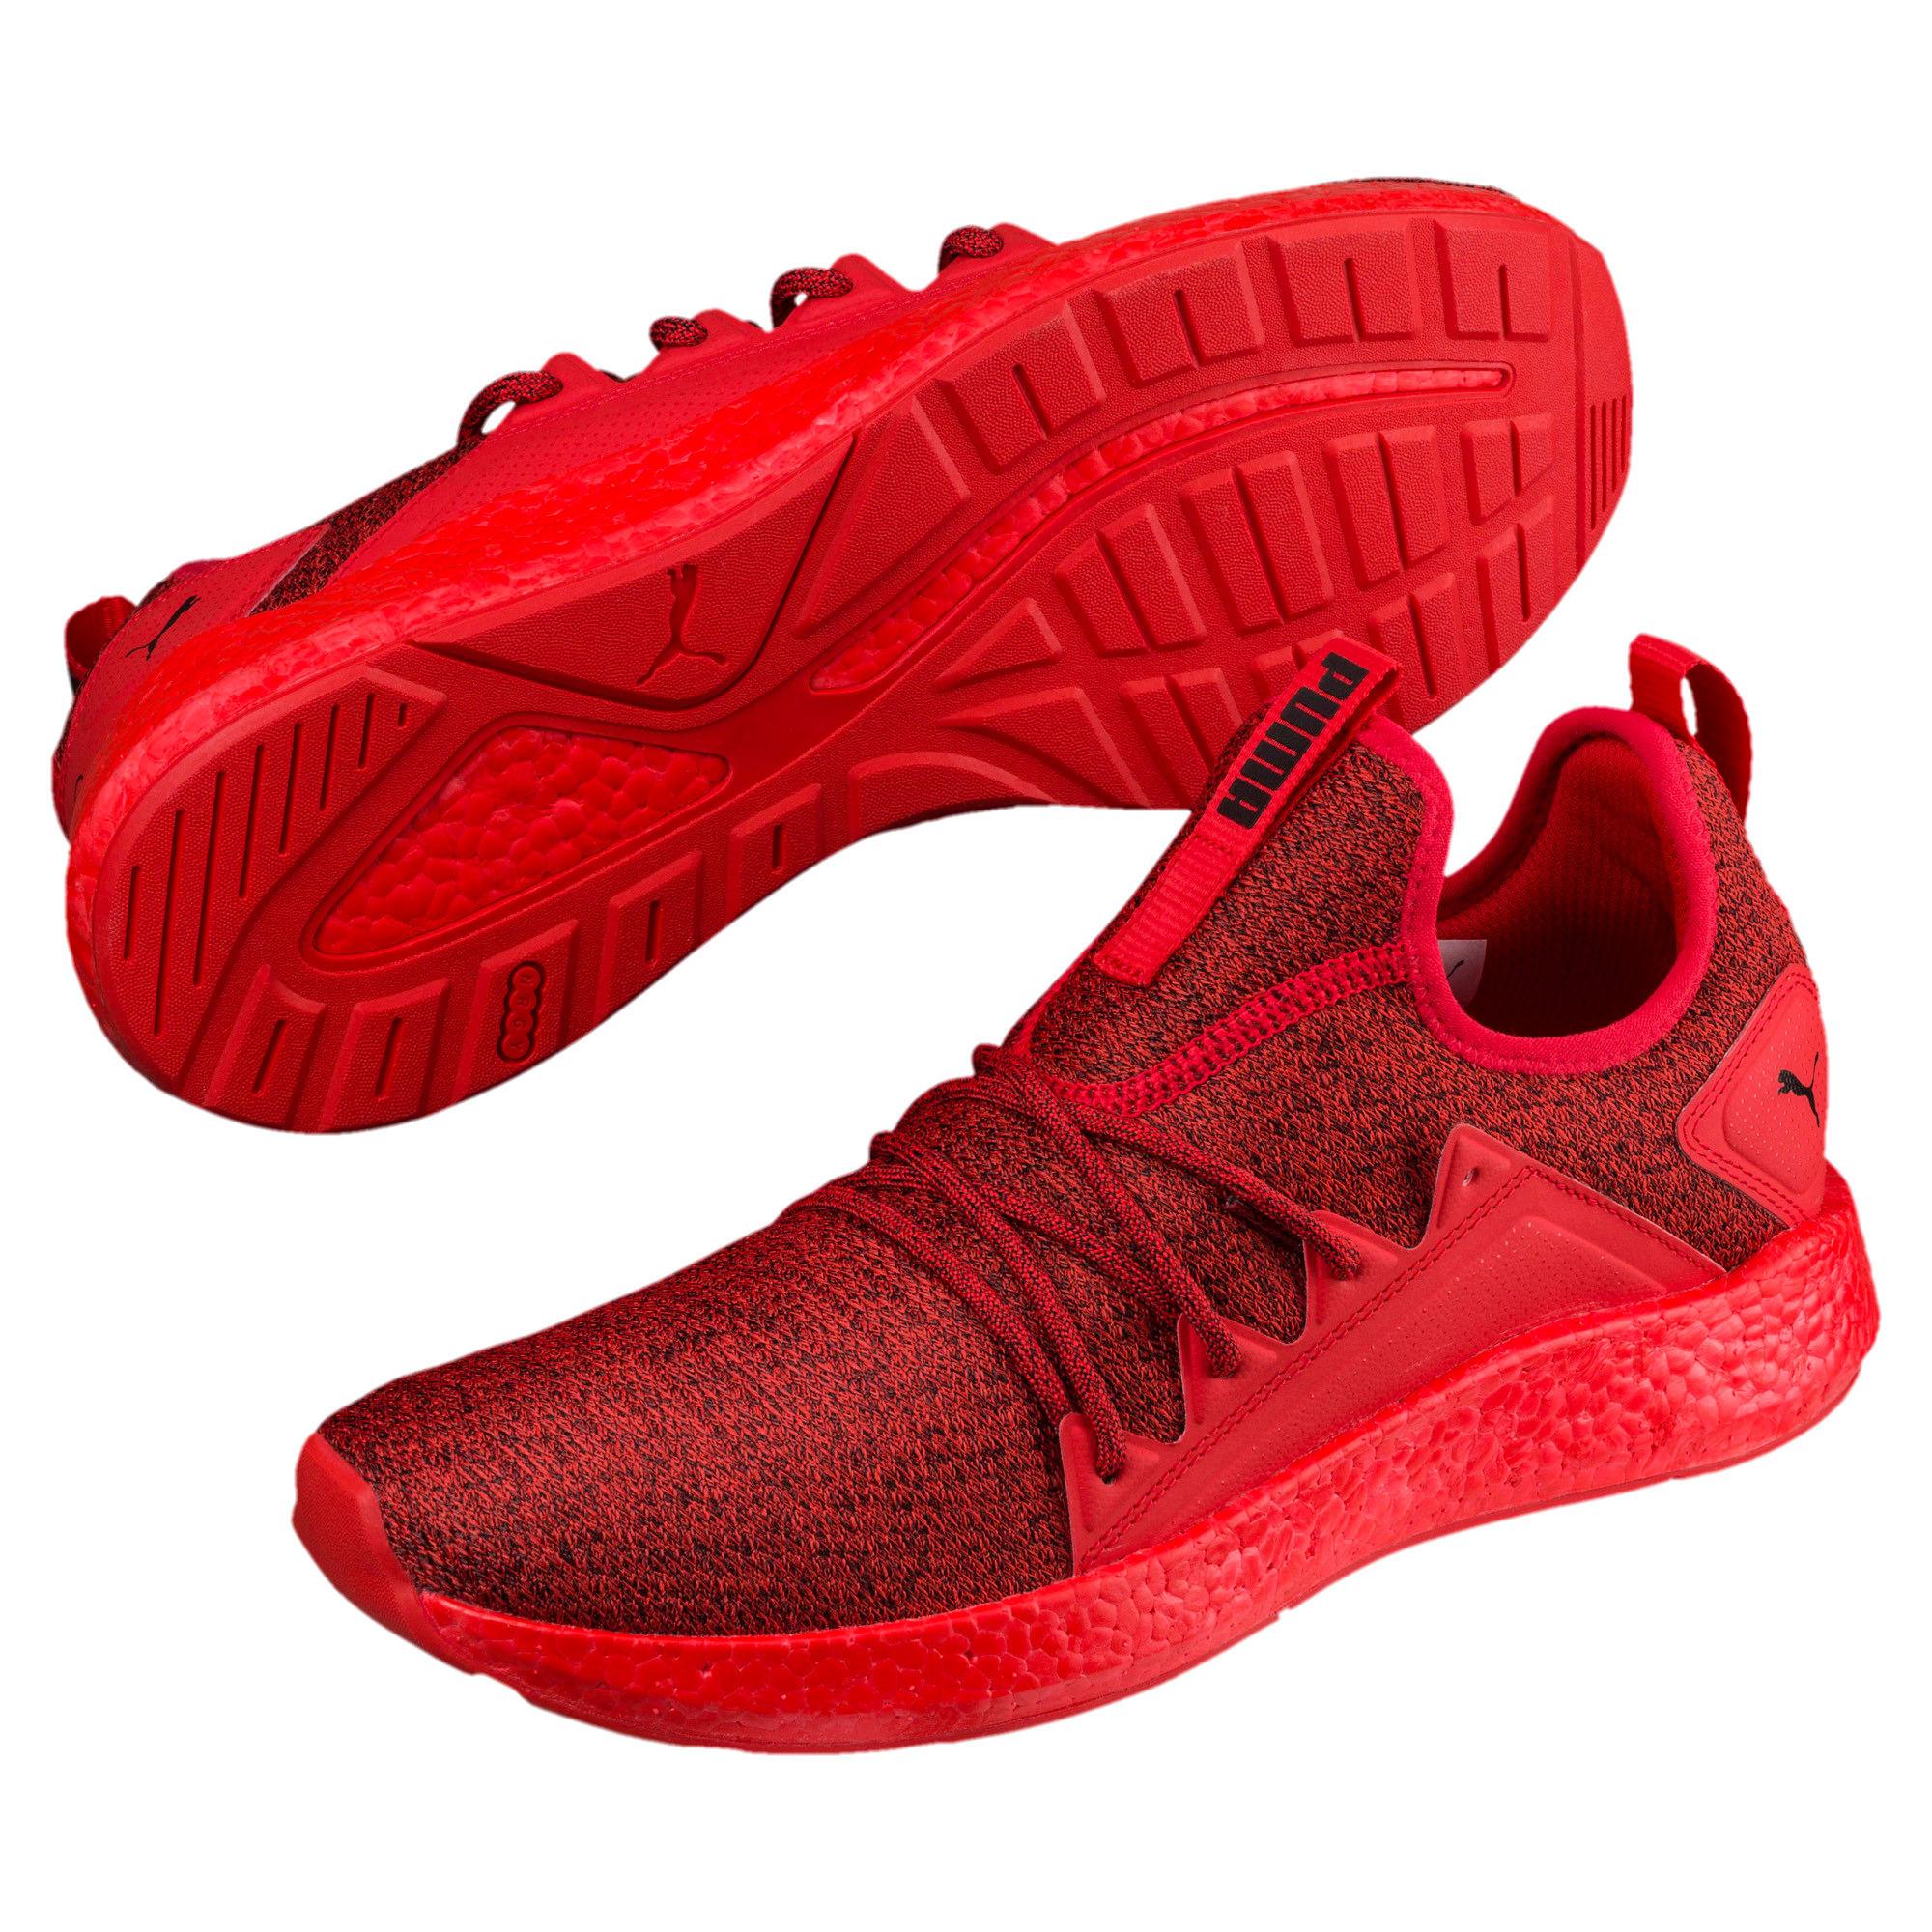 Thumbnail 2 of NRGY Neko Knit Men's Running Shoes, High Risk Red-Puma Black, medium